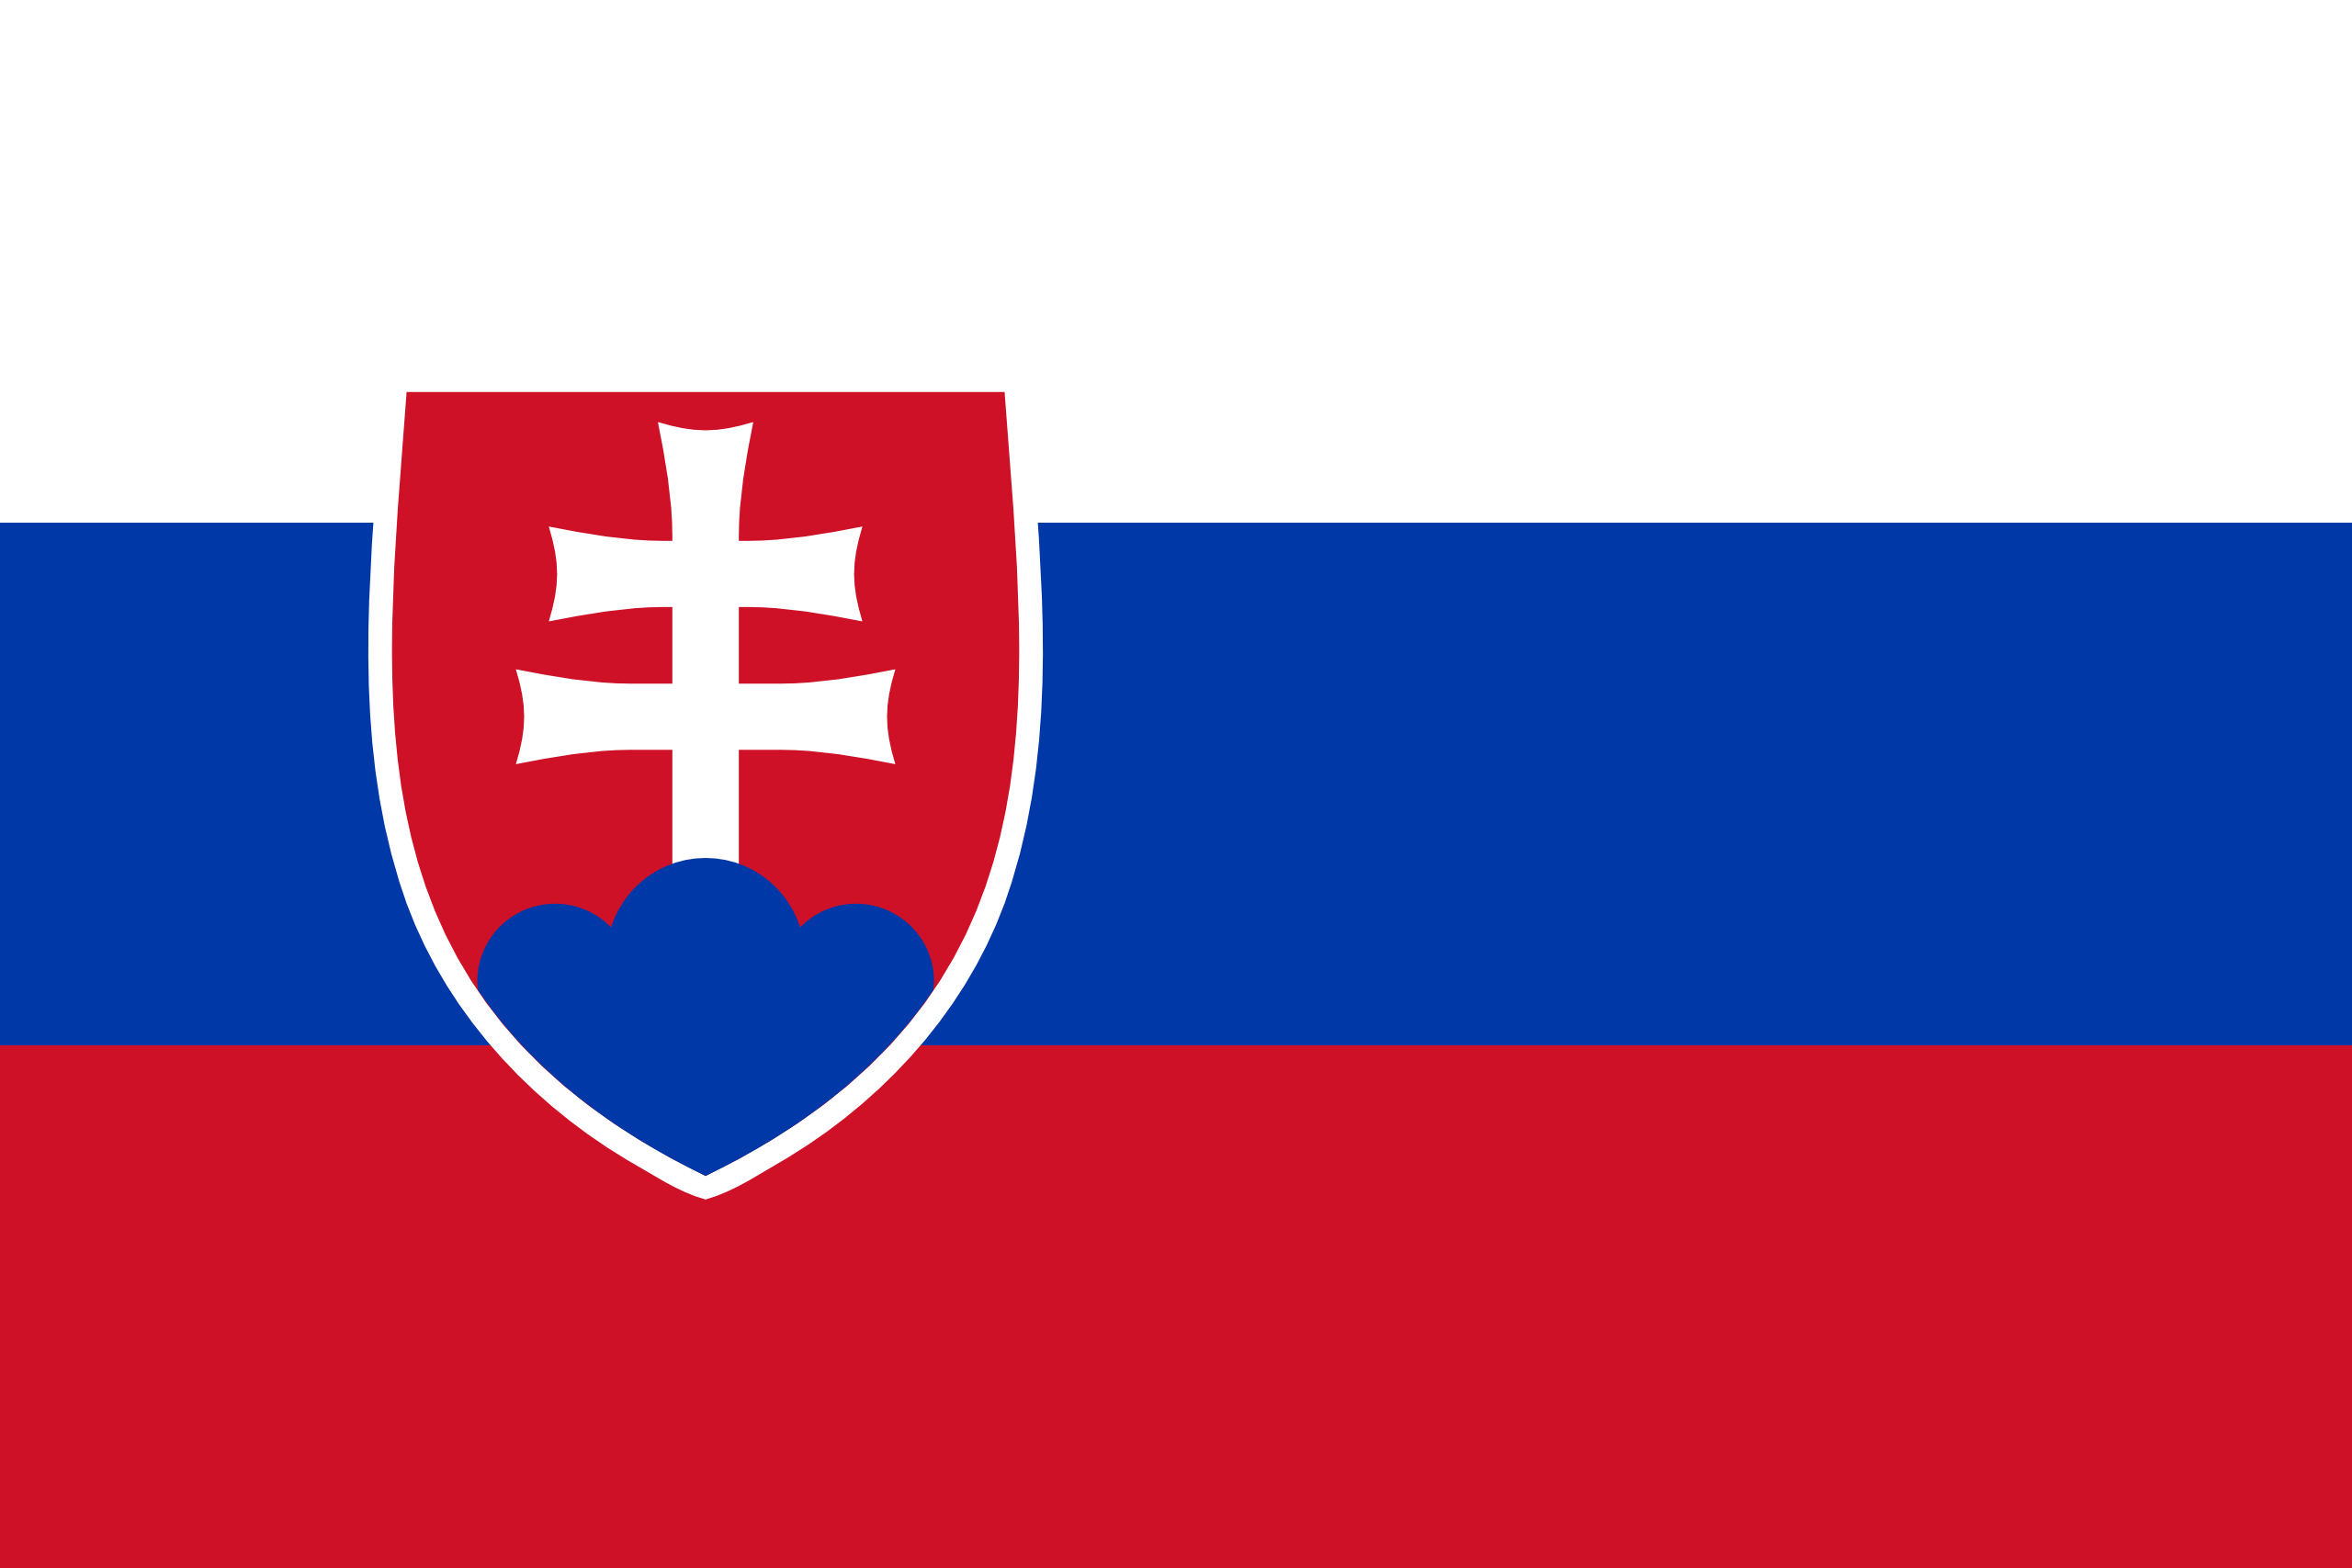 Slovaquie, pays, emblème, logo, symbole - Fonds d'écran HD - Professor-falken.com